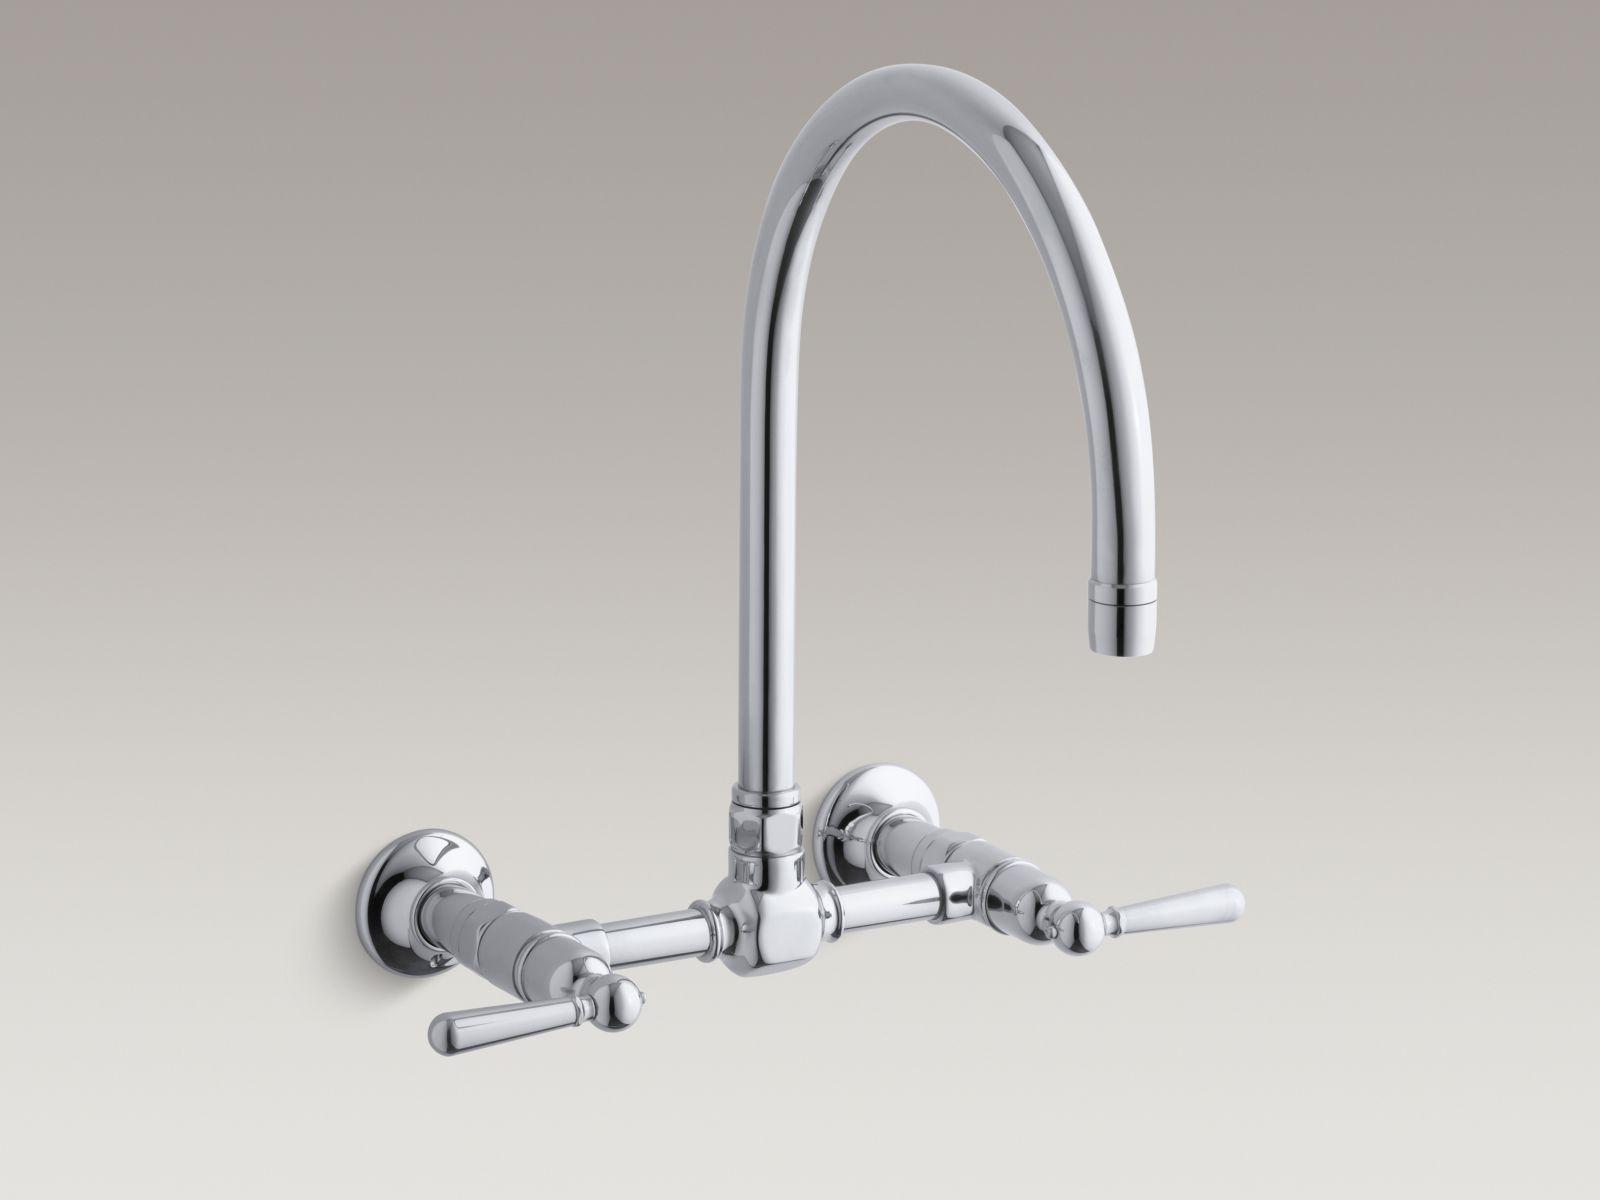 Ideas, buyplumbing category wall mount faucet regarding proportions 1600 x 1200  .